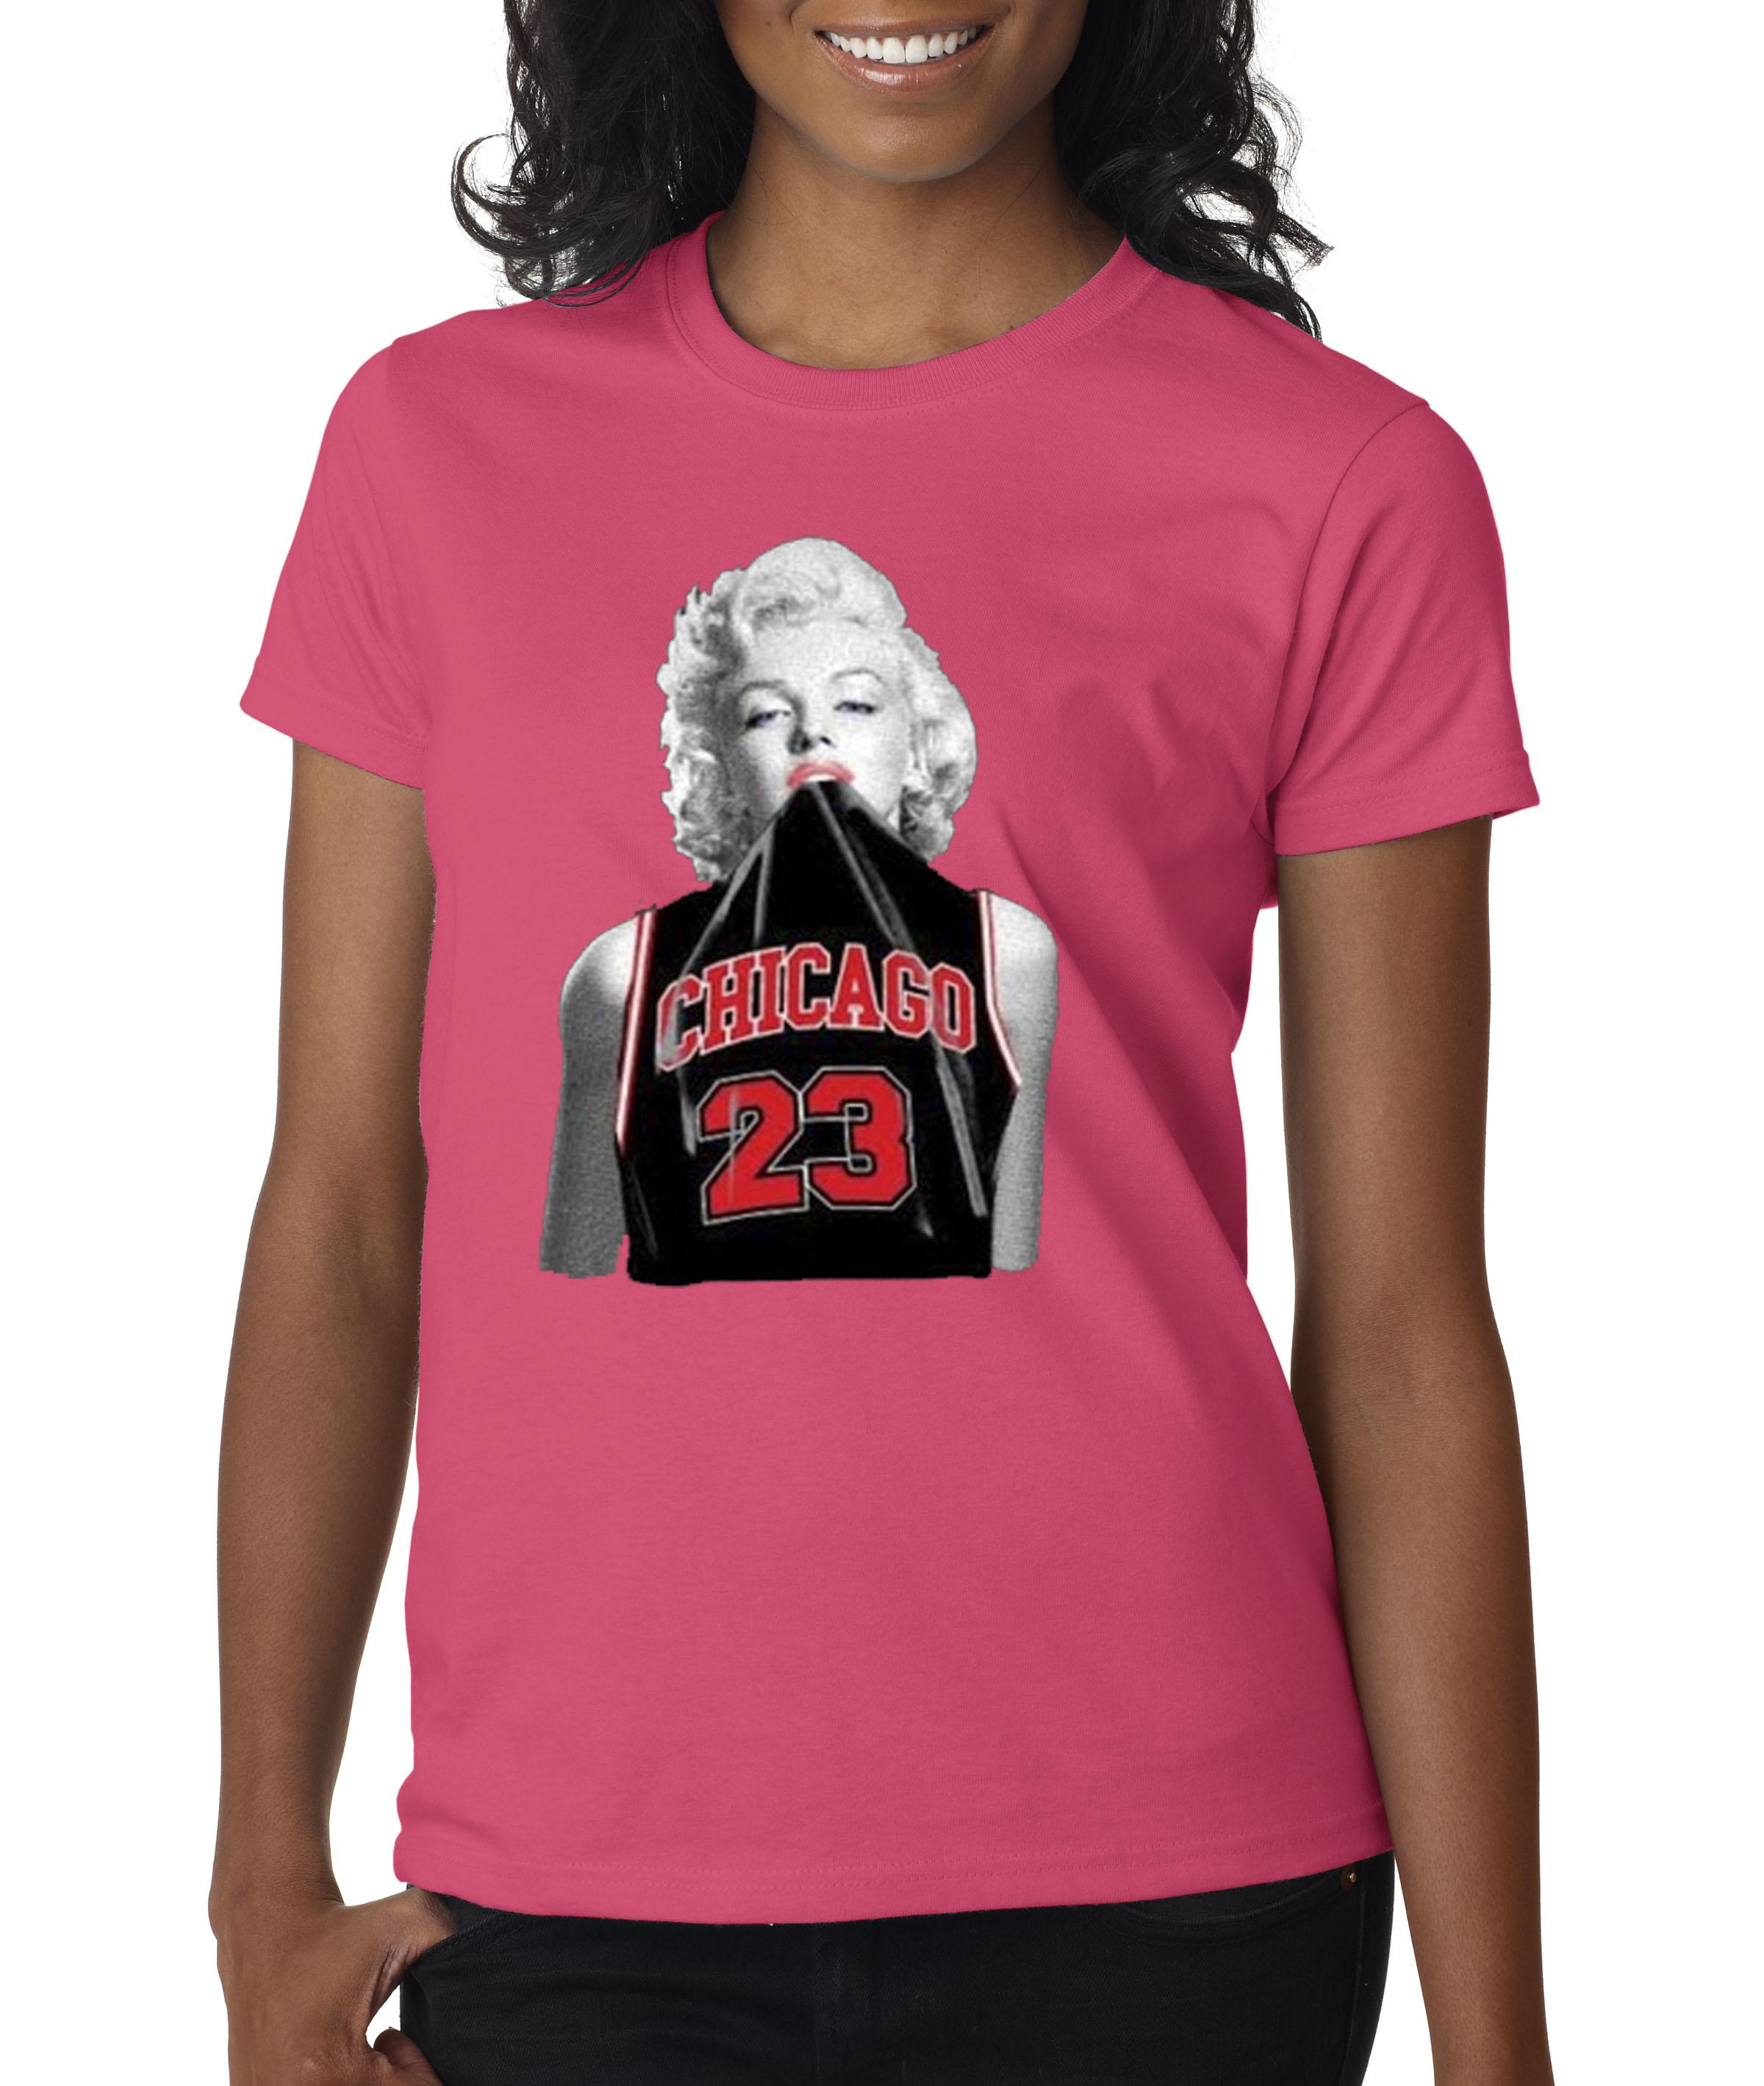 New Way 445 Womens T Shirt Marilyn Monroe Chicago Bulls Jordan 23